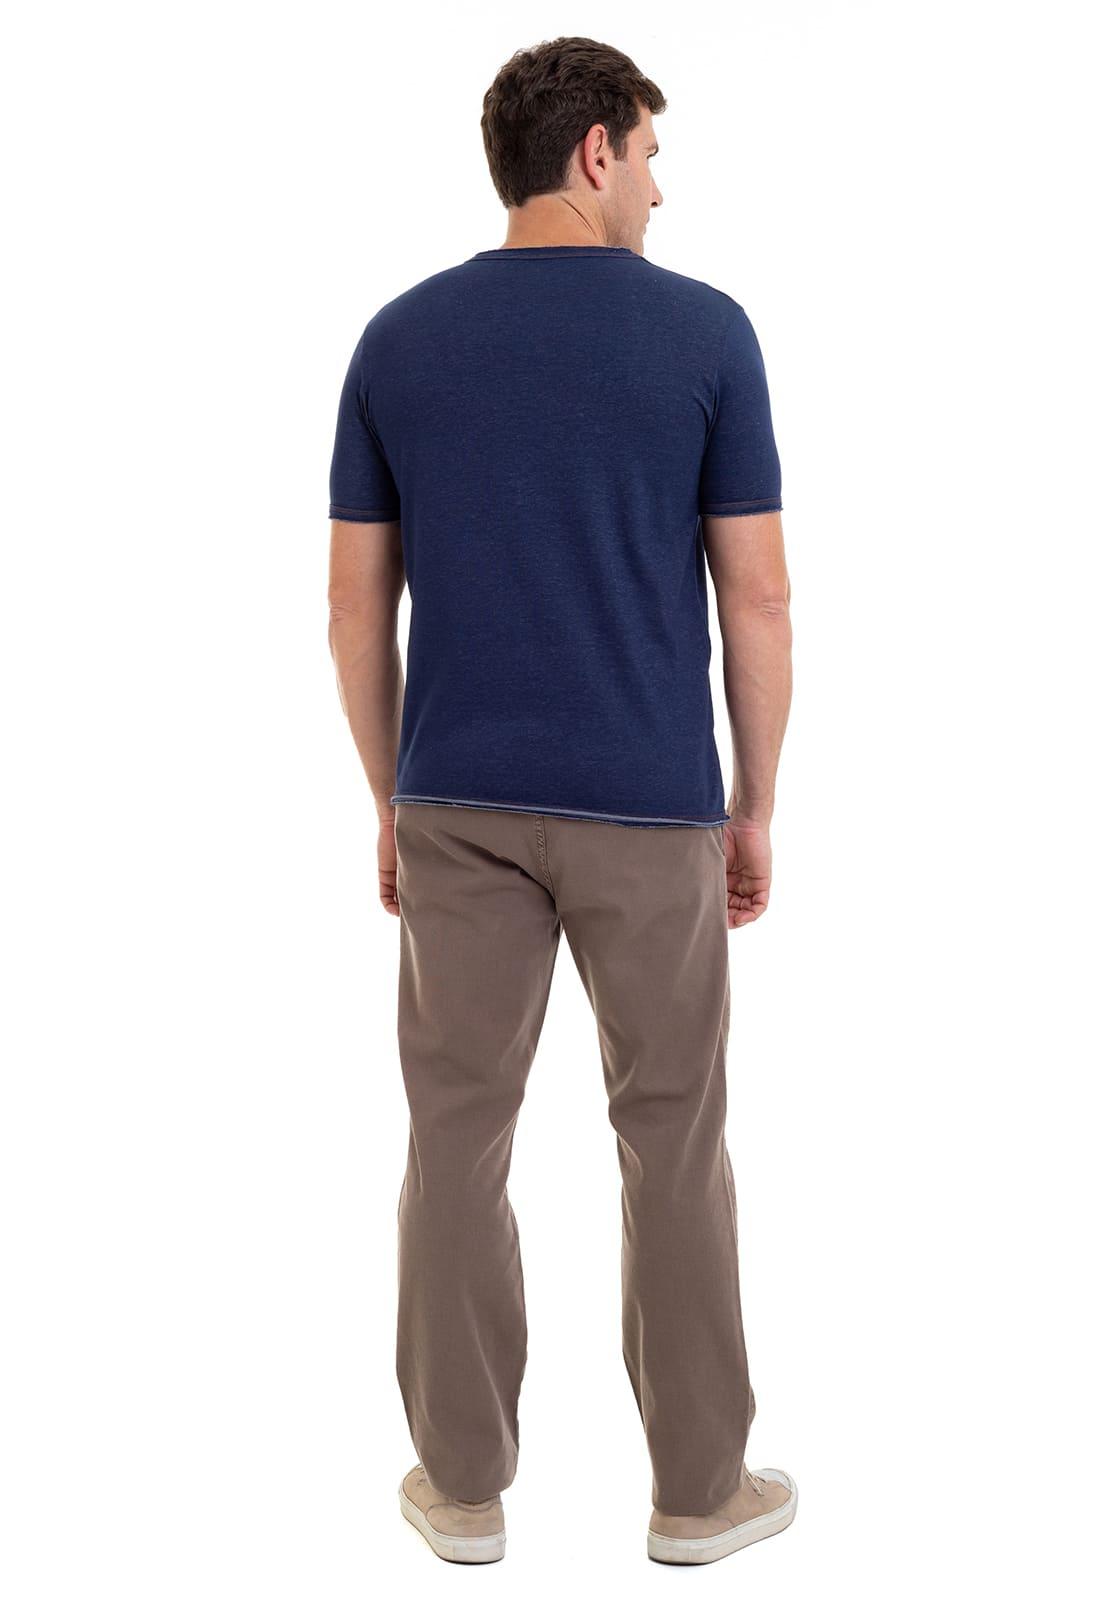 Camiseta em Malha Jeans Hifen